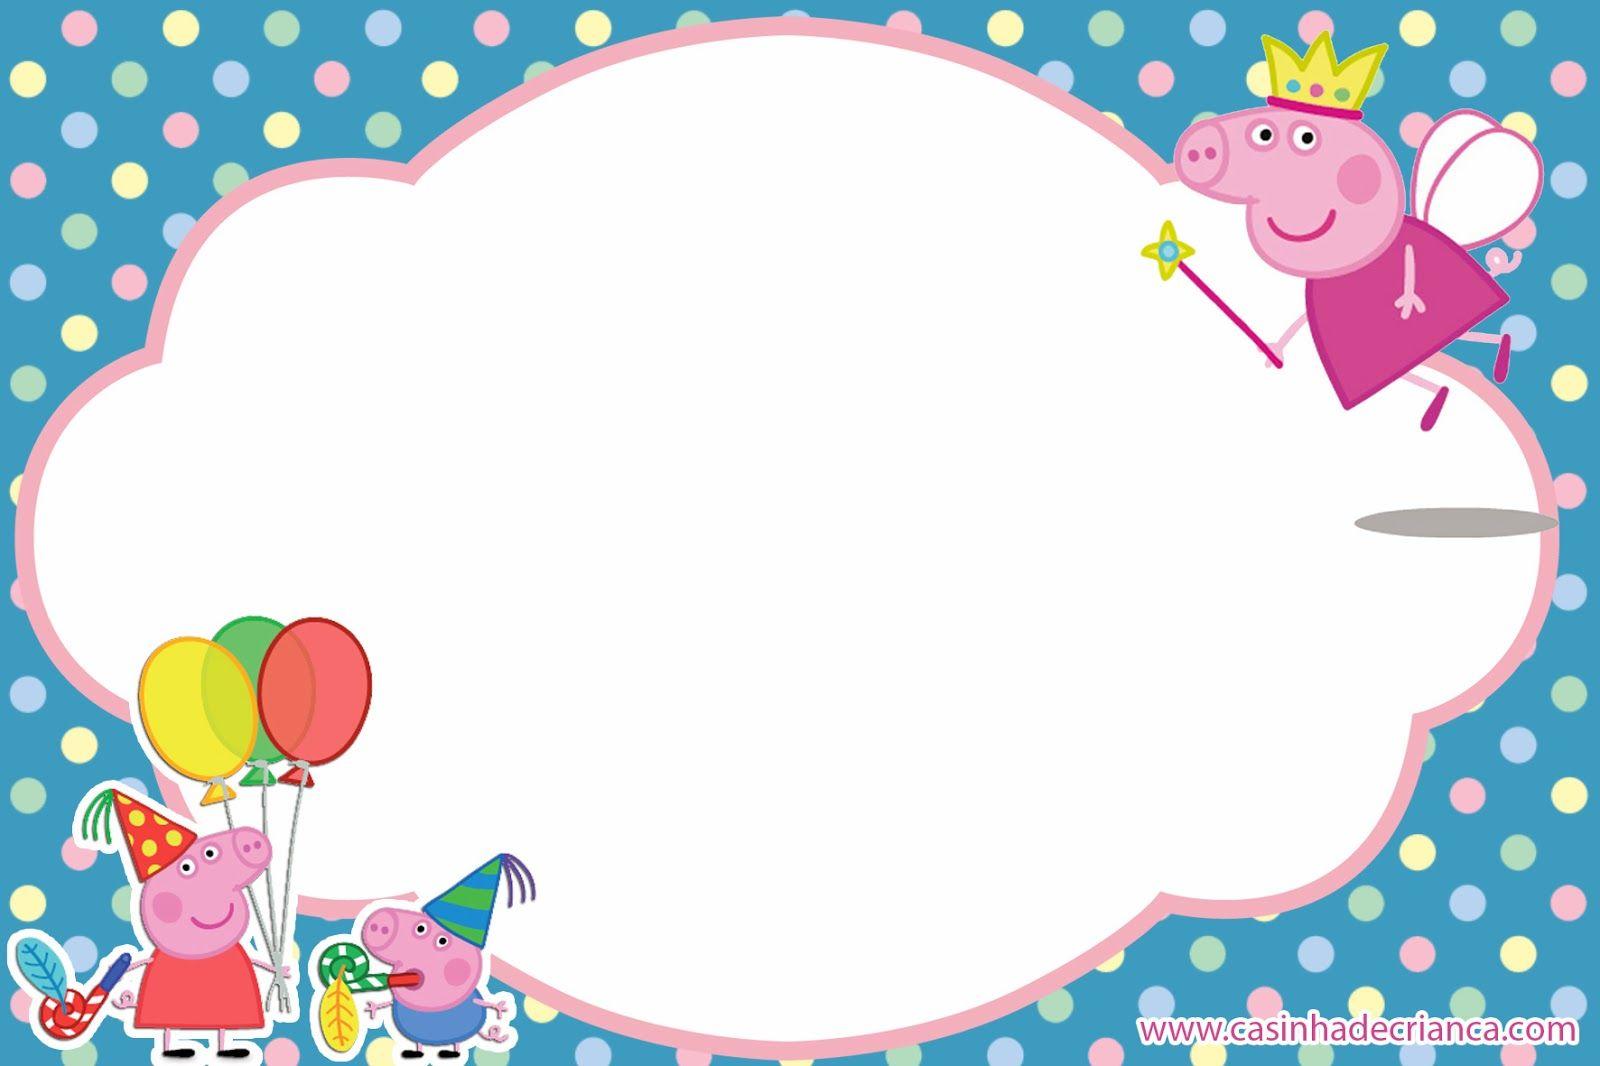 Kit Festa Peppa Pig Para Imprimir Gratis Festa Peppa Pig Festa